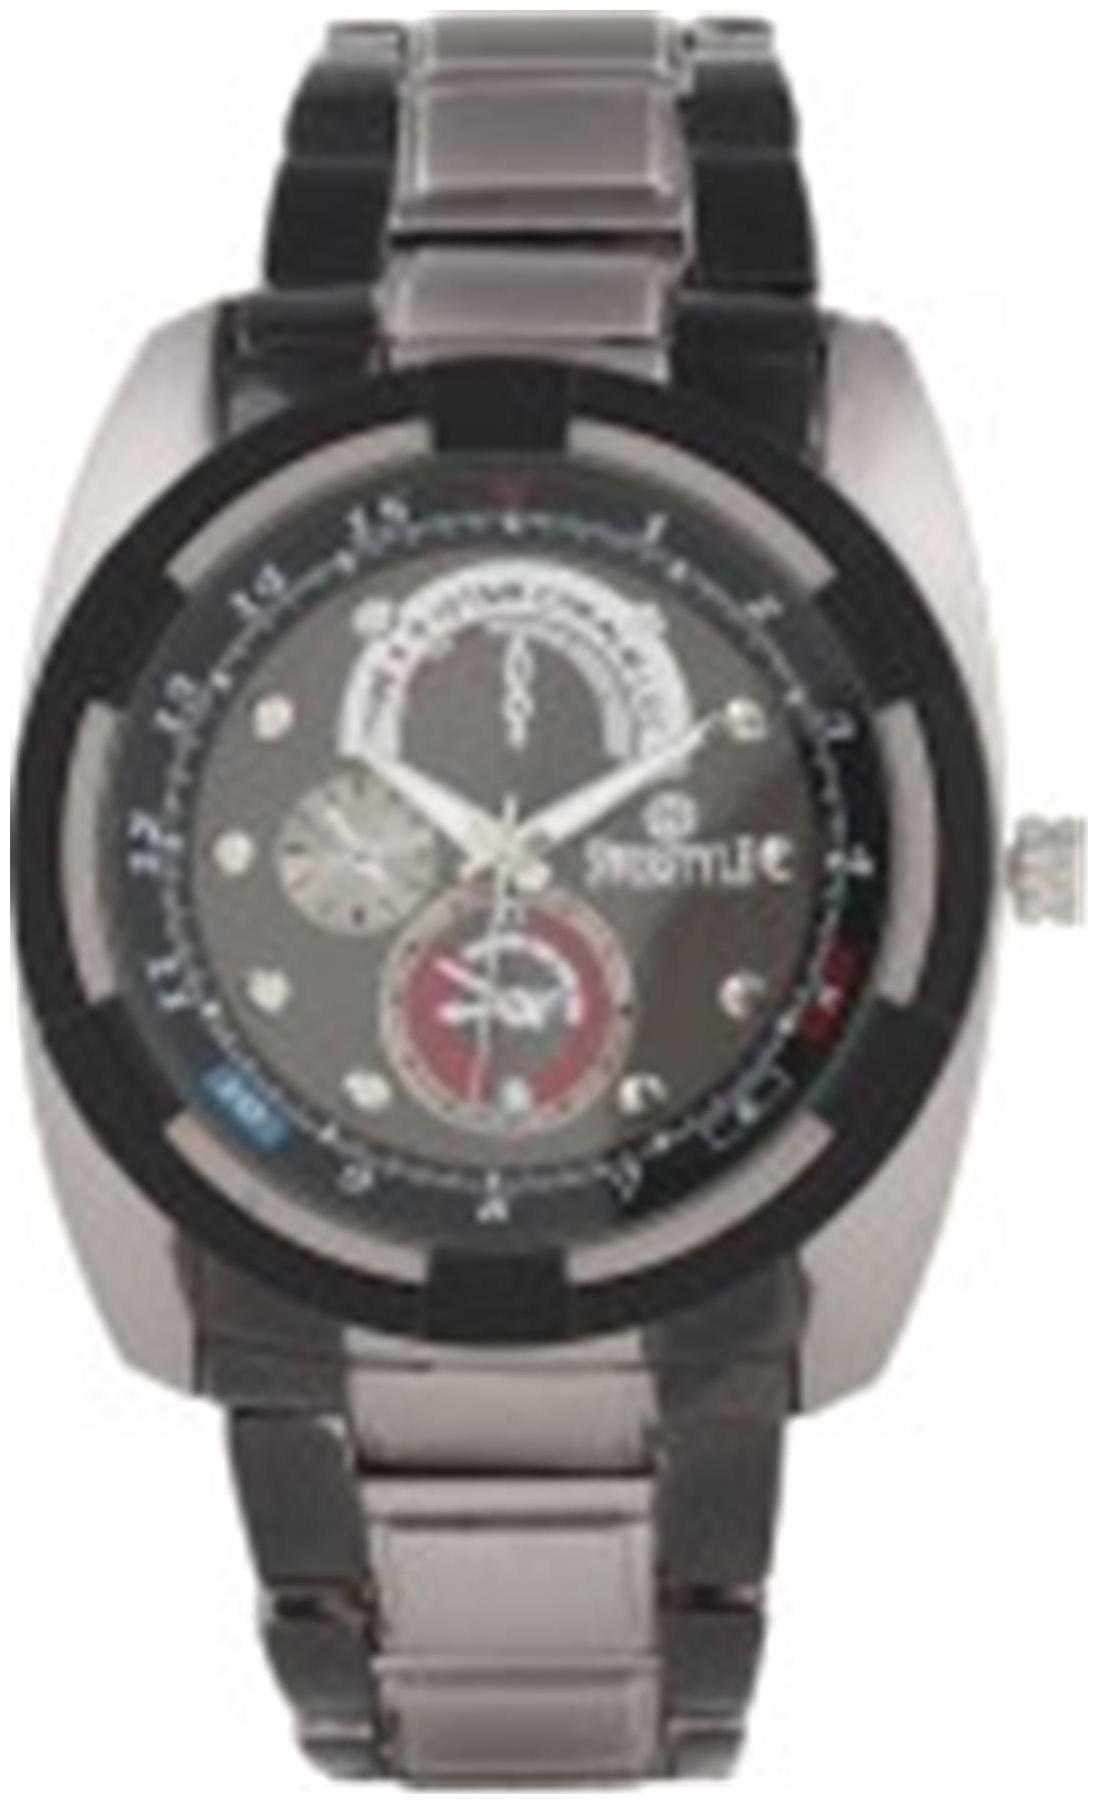 Swisstyle SS GR605 BLK CH analog watch for men